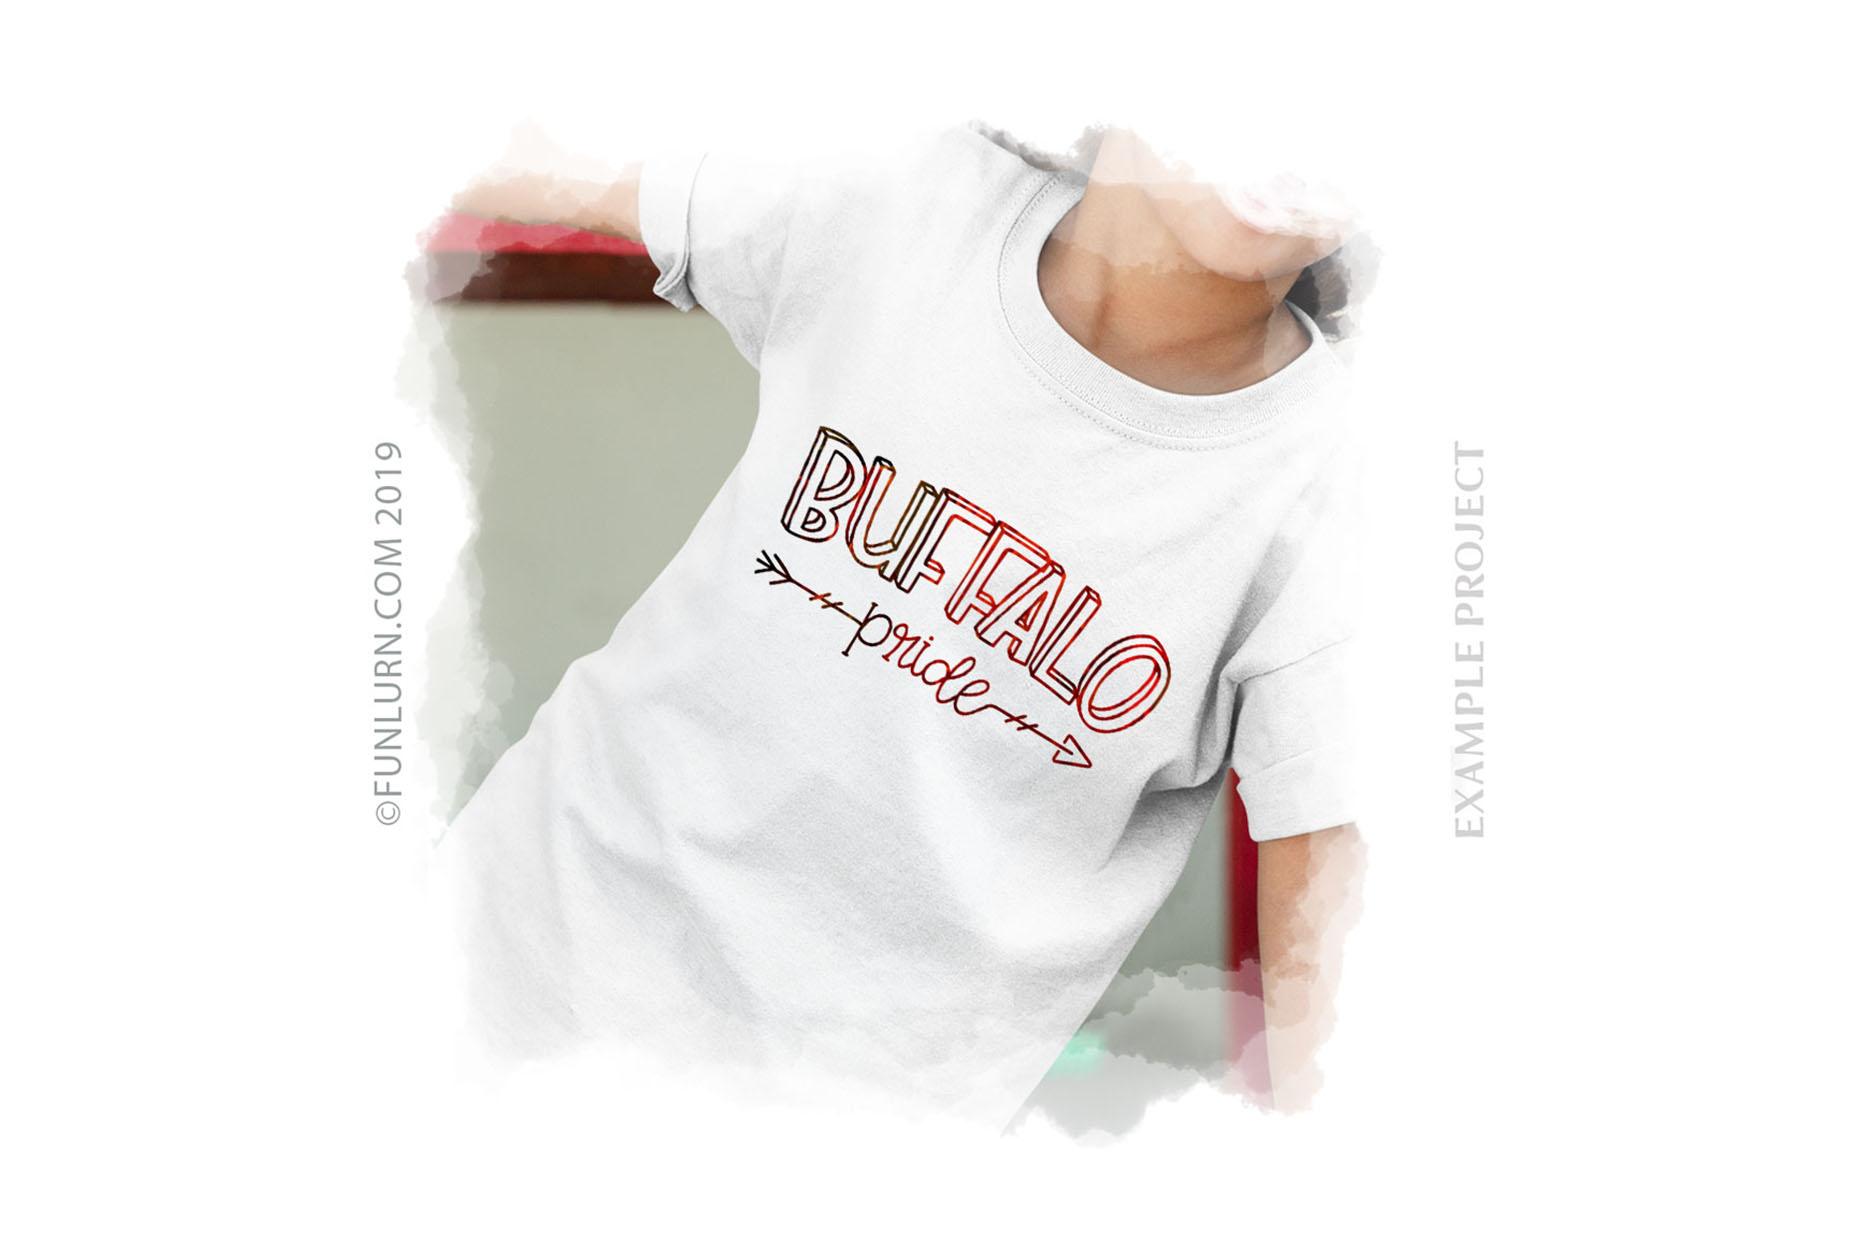 Buffalo Pride Team SVG Cut File example image 3